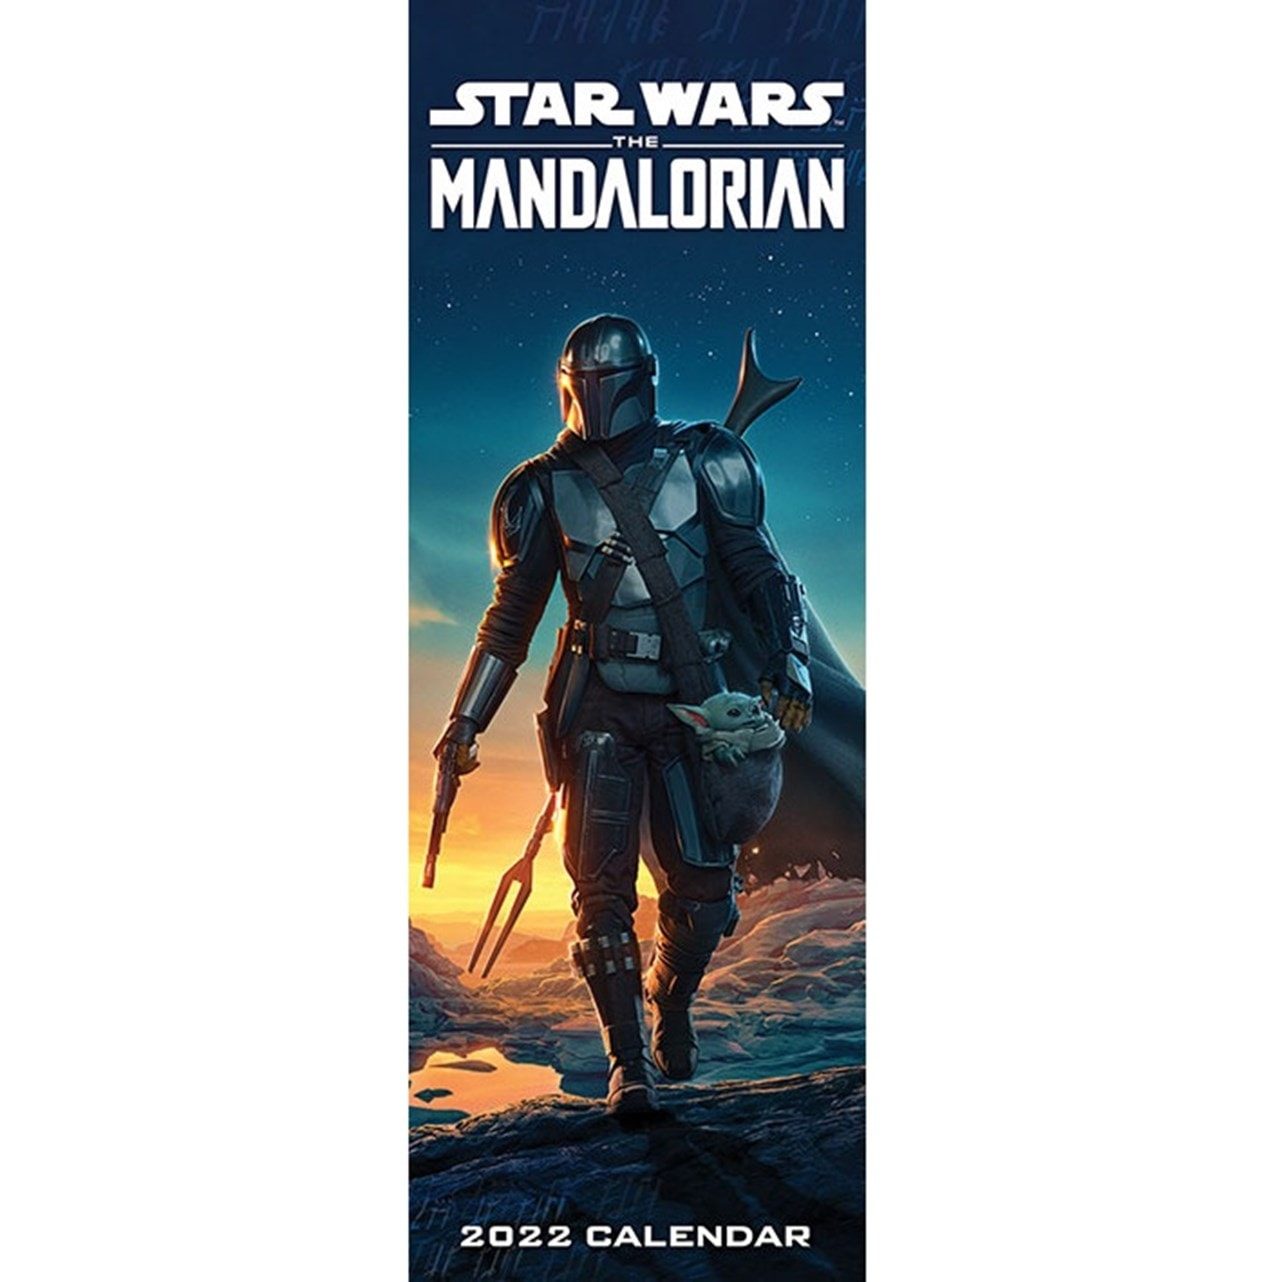 Star Wars Calendar 2022.The Mandalorian Star Wars Slim 2022 Calendar Calendars Free Shipping Over 20 Hmv Store